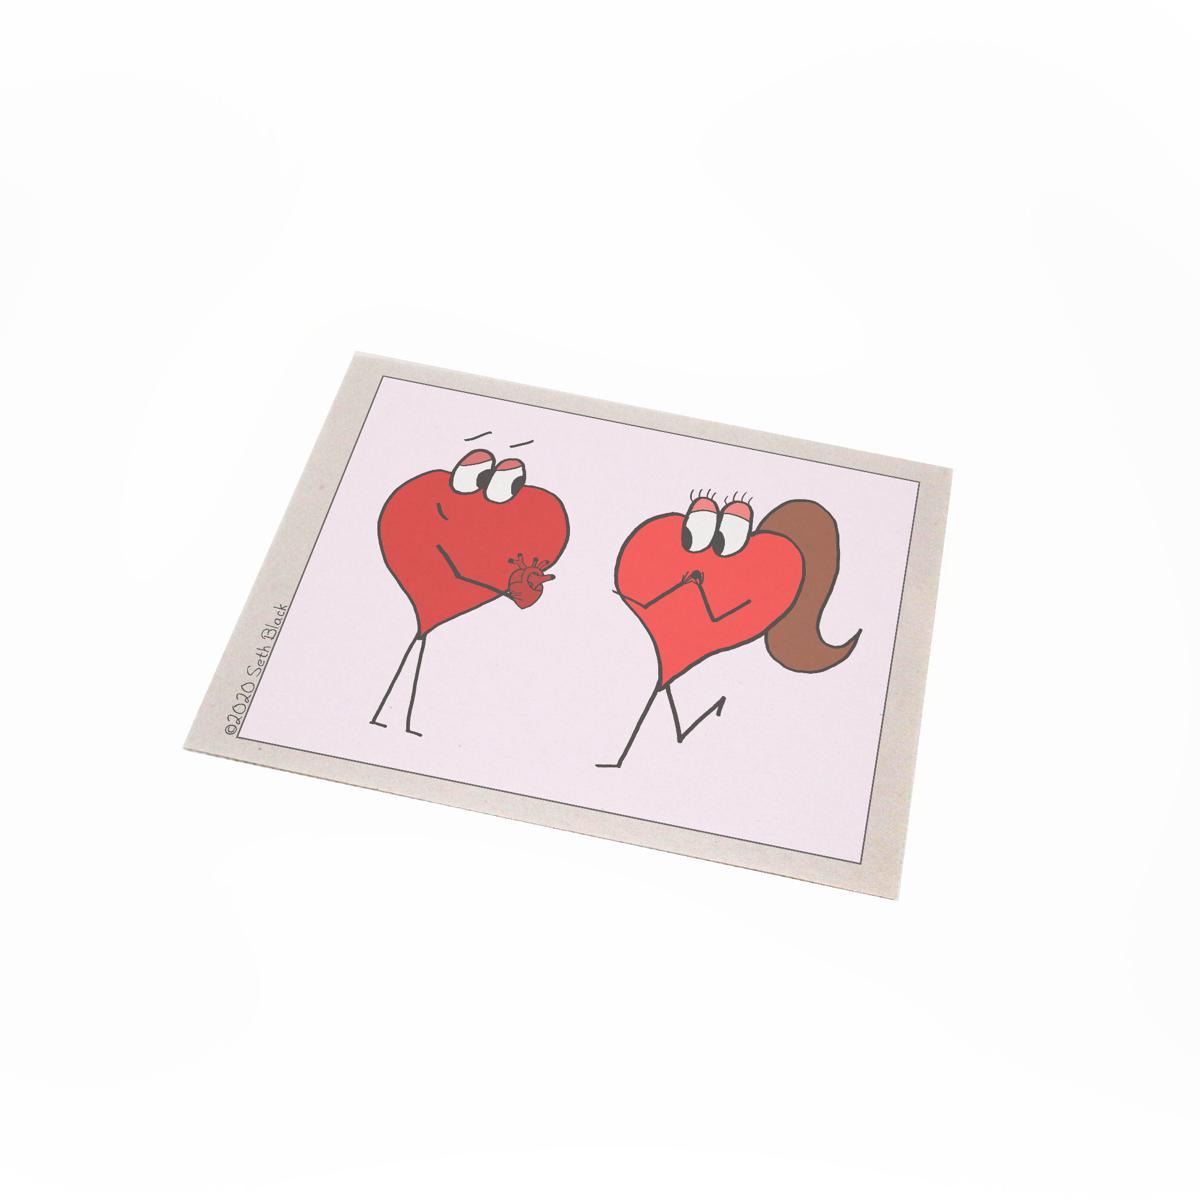 Heart Giving Heart - Valentine's Day 2020 Newsprint